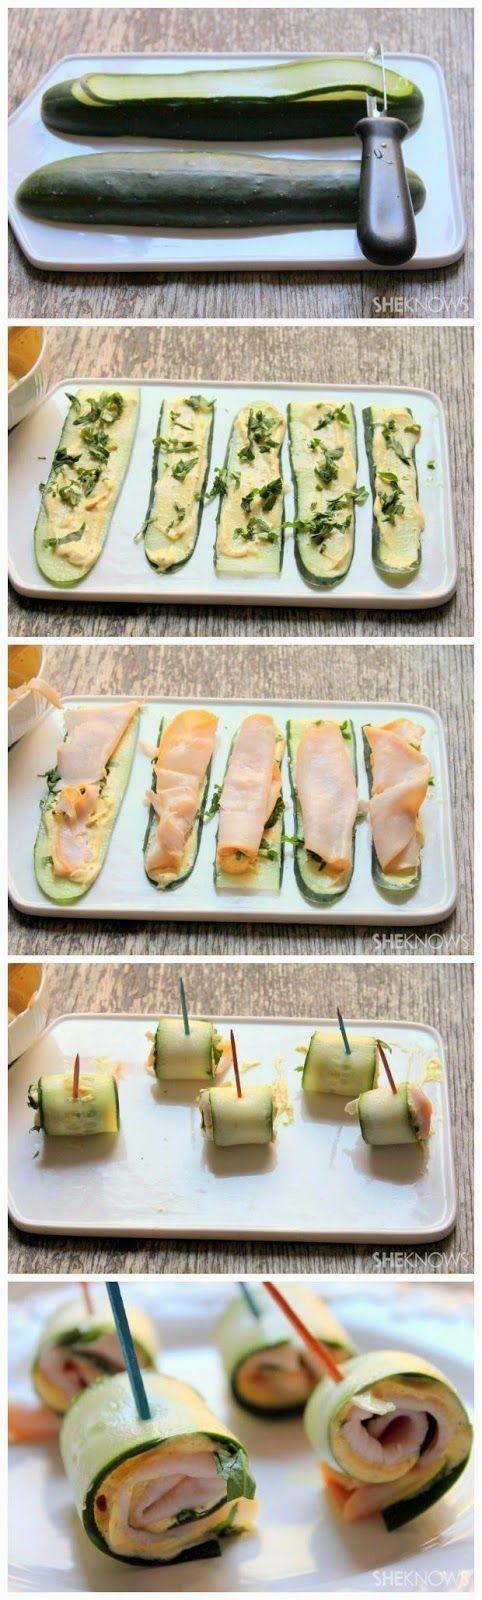 Cucumber roll-ups